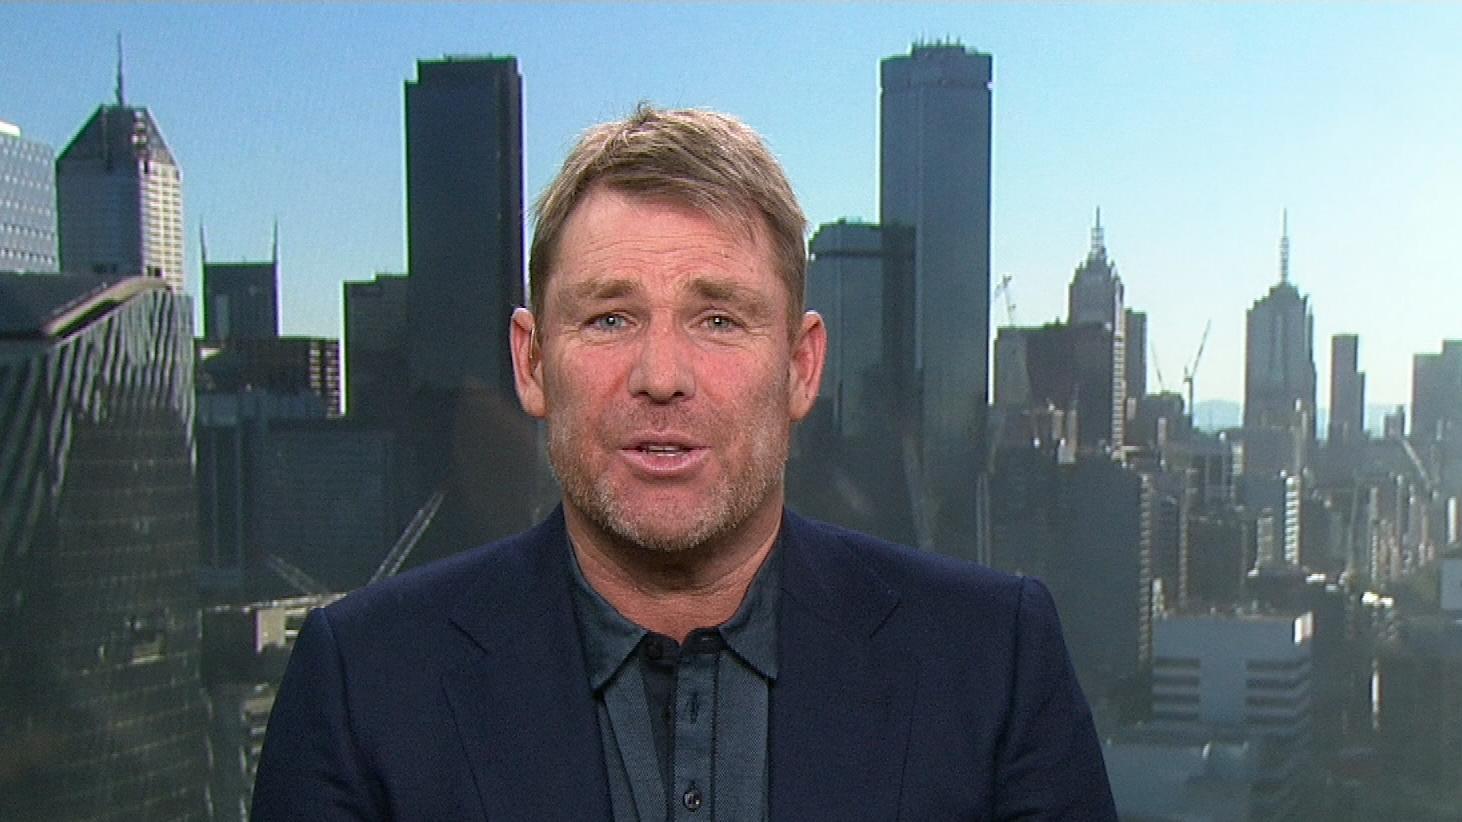 Aussies 'need Smith and Warner back': Warne